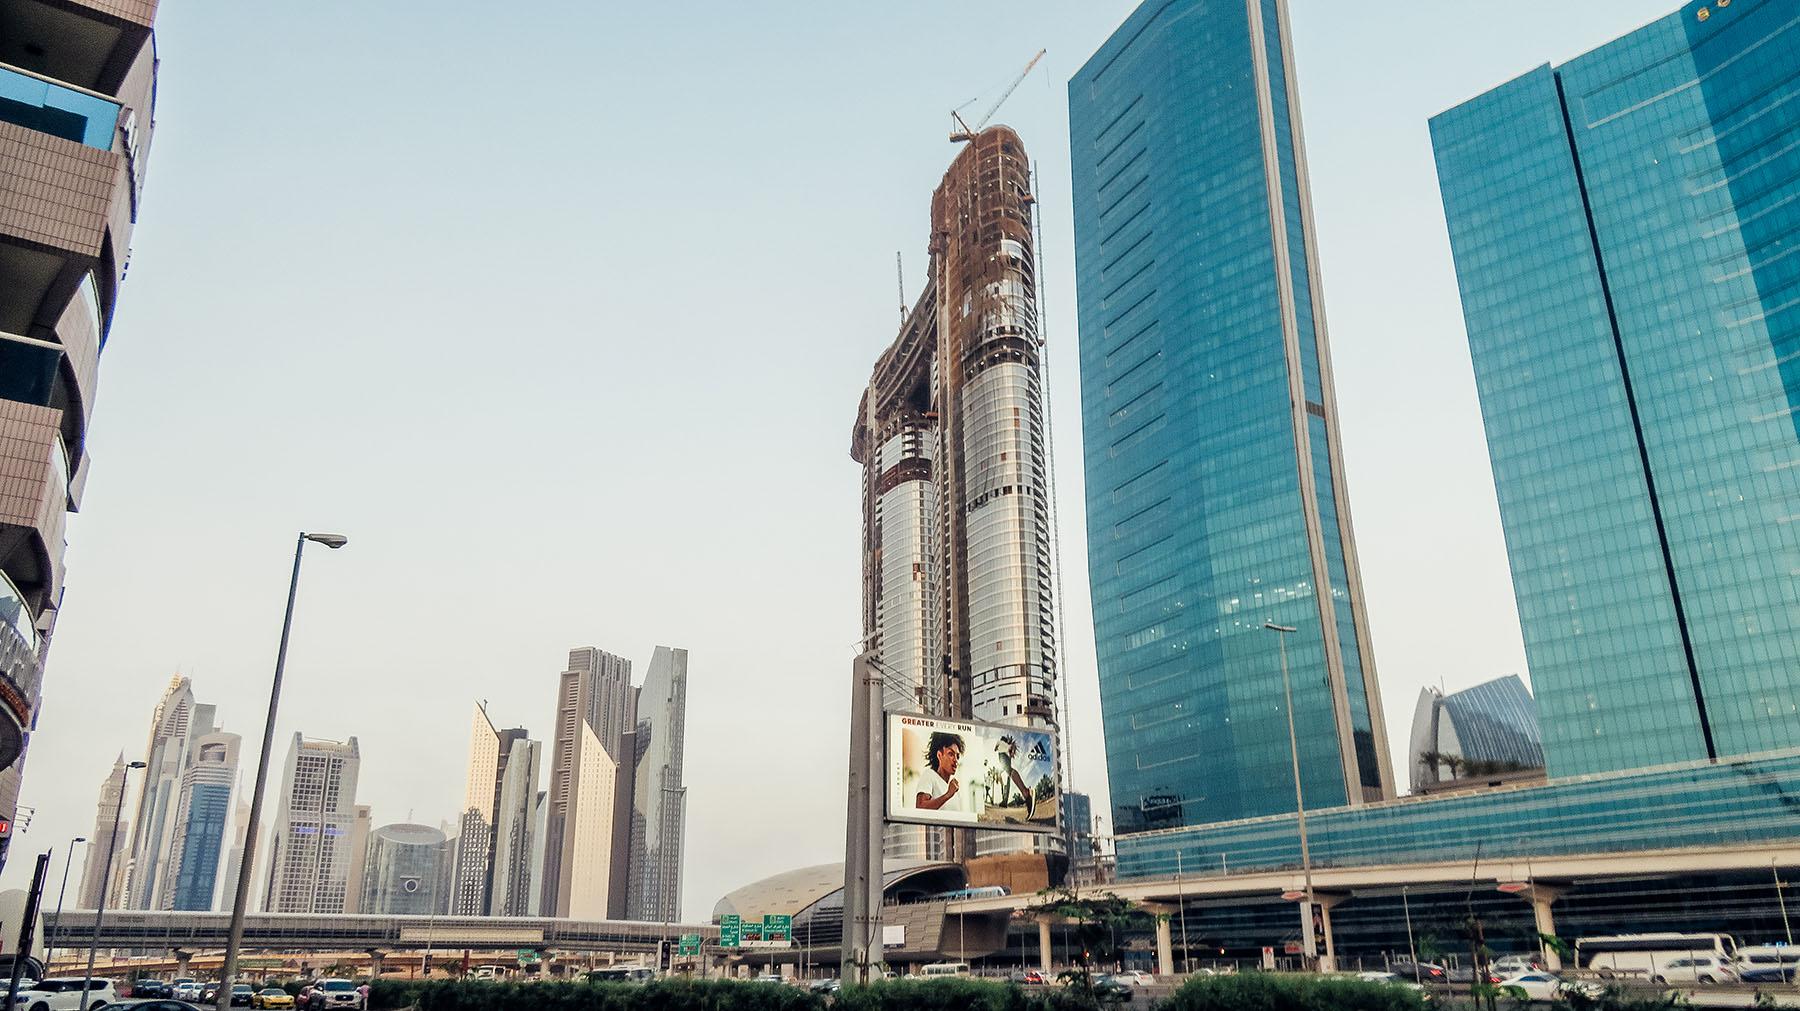 Dubai Mall Tunnel